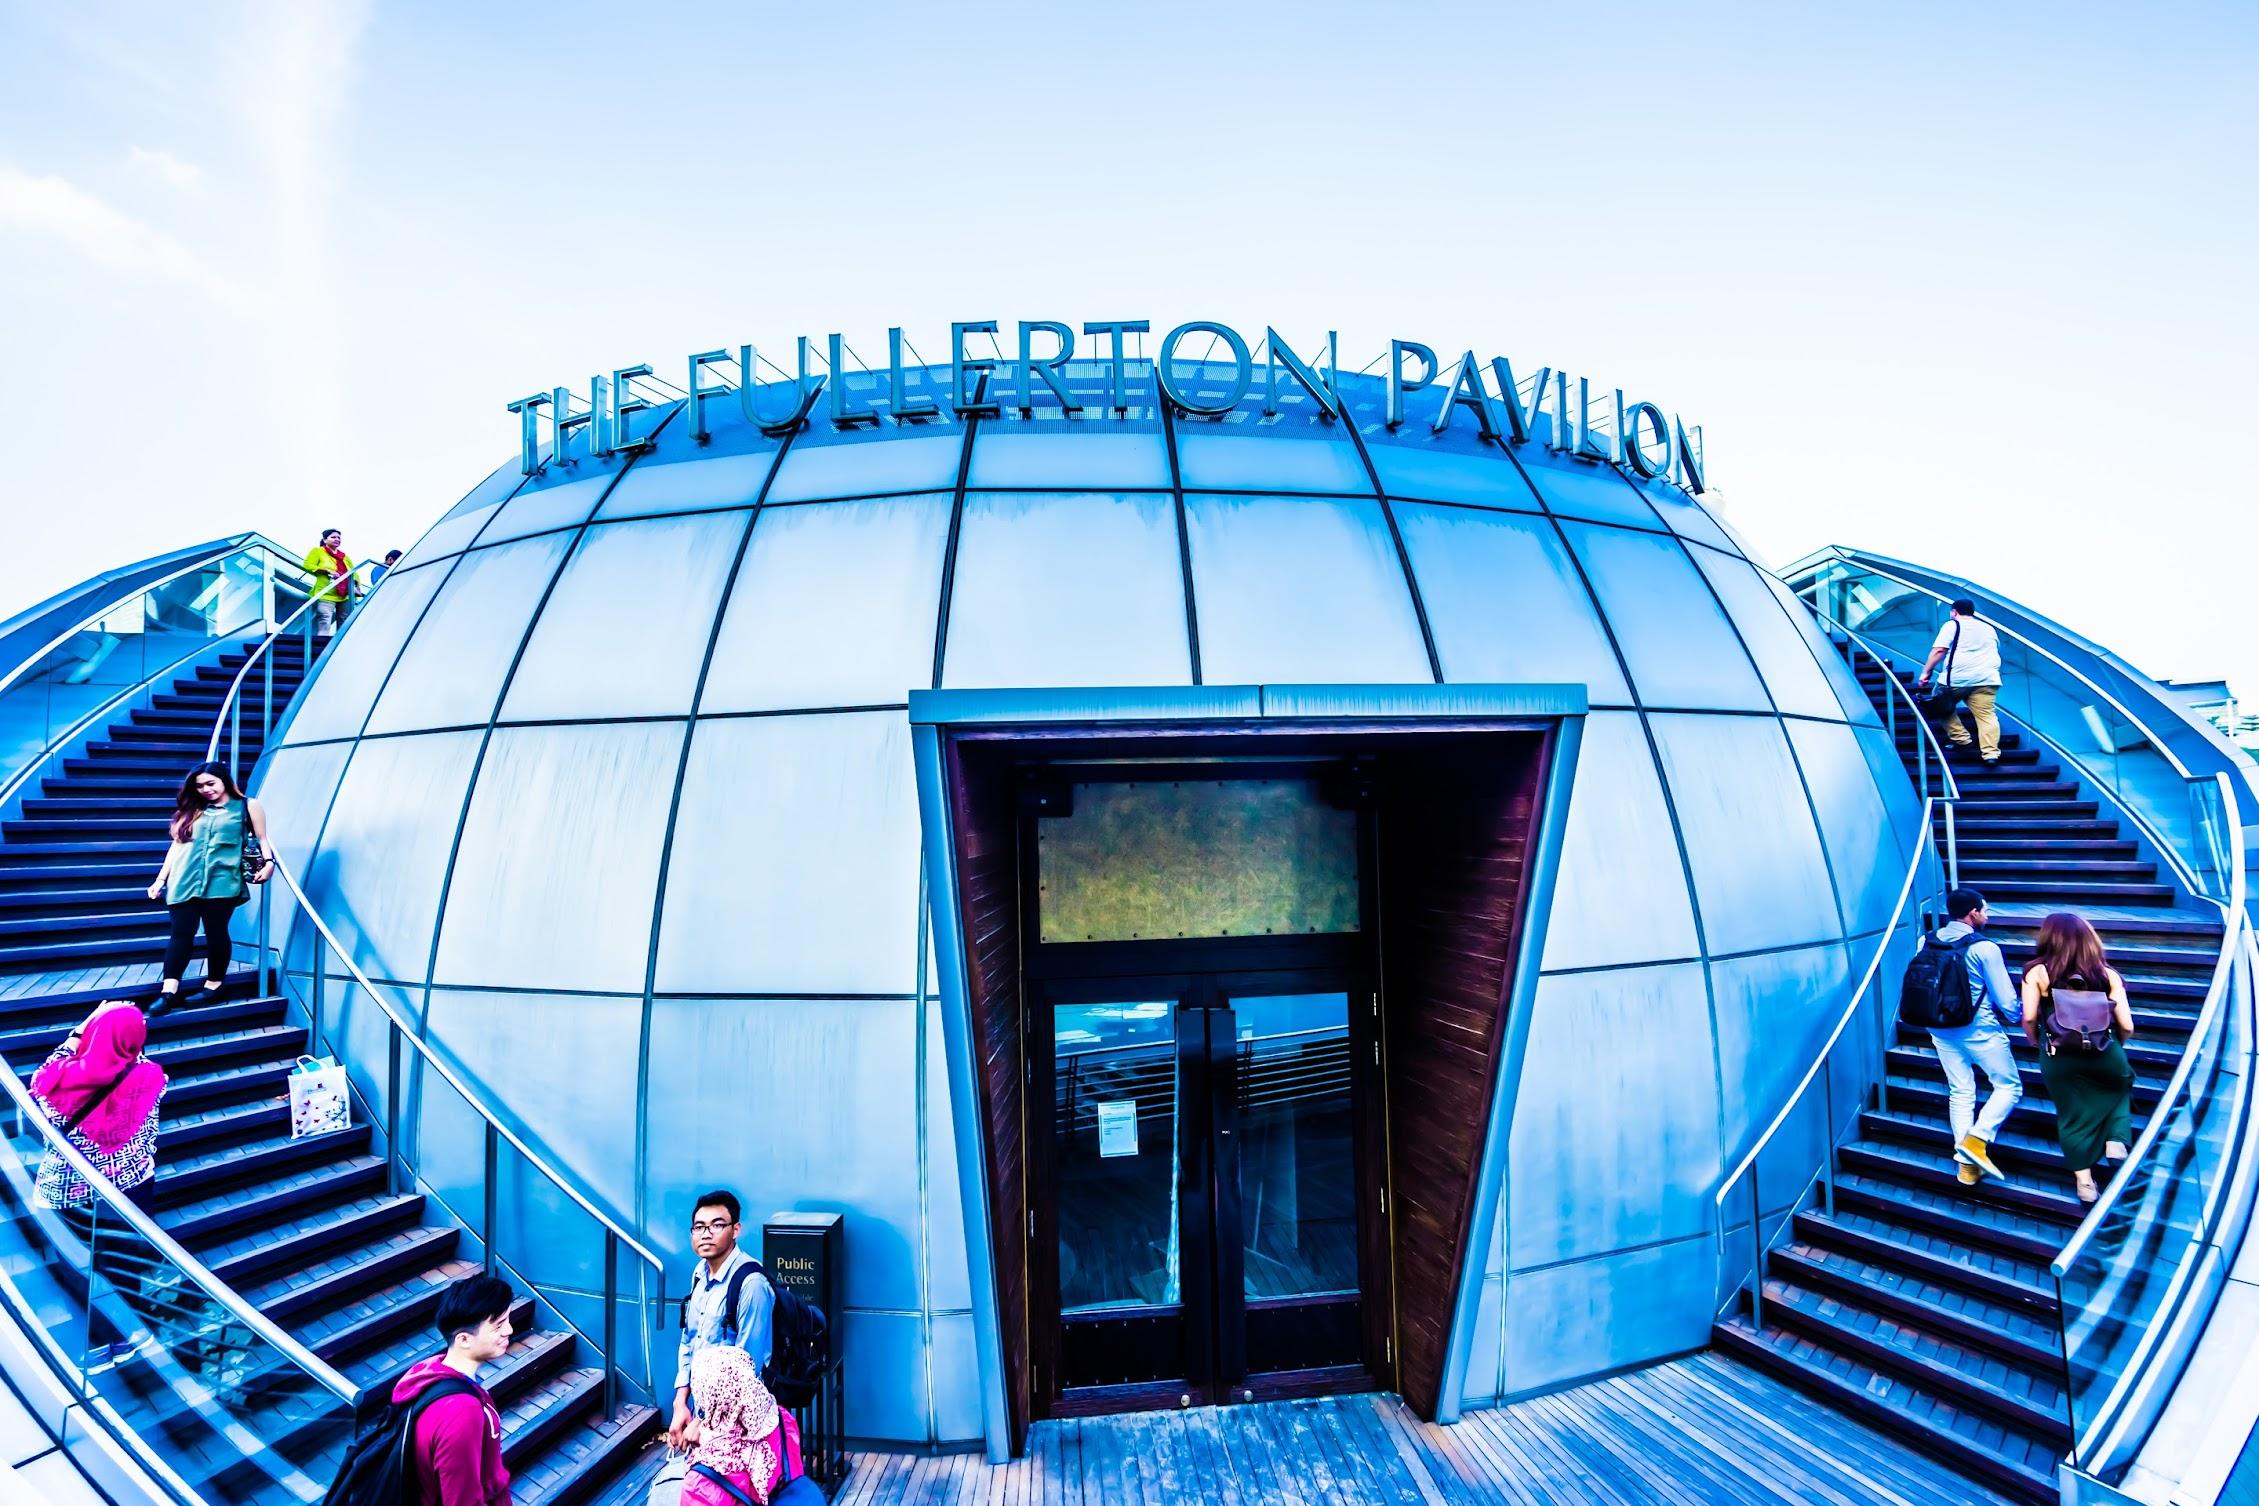 Singapore The Fullerton Pavilion